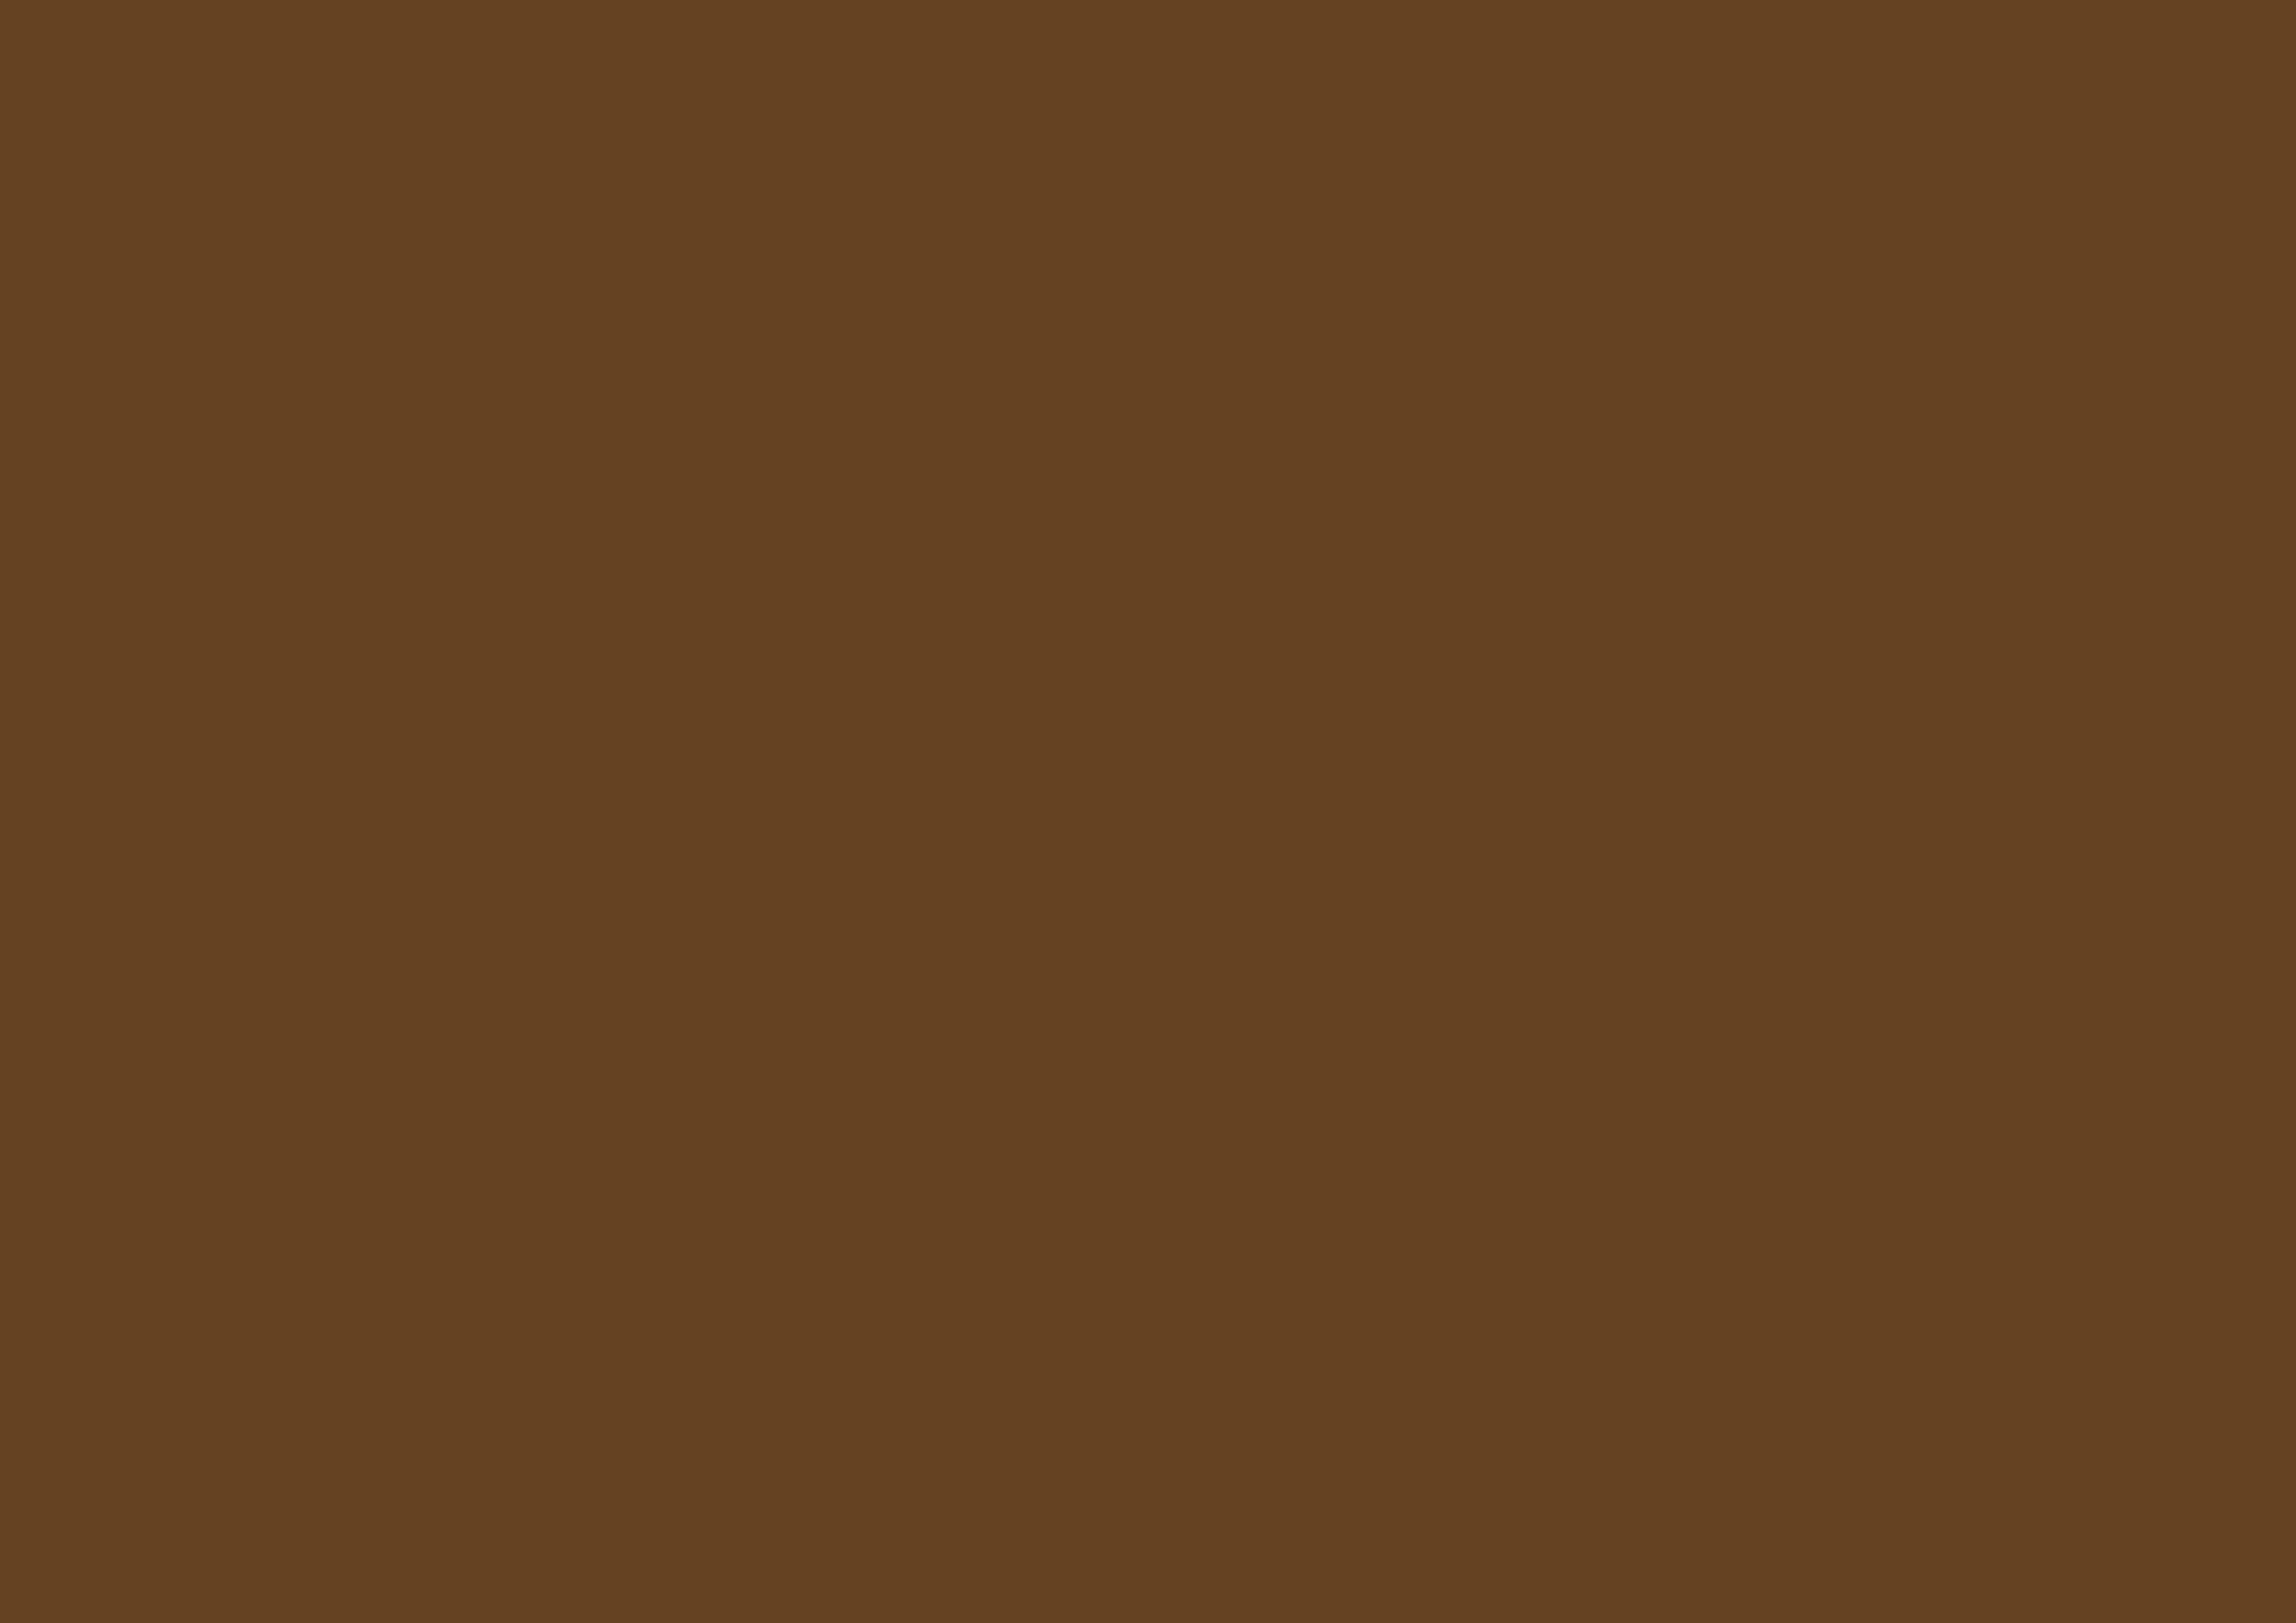 3508x2480 Dark Brown Solid Color Background